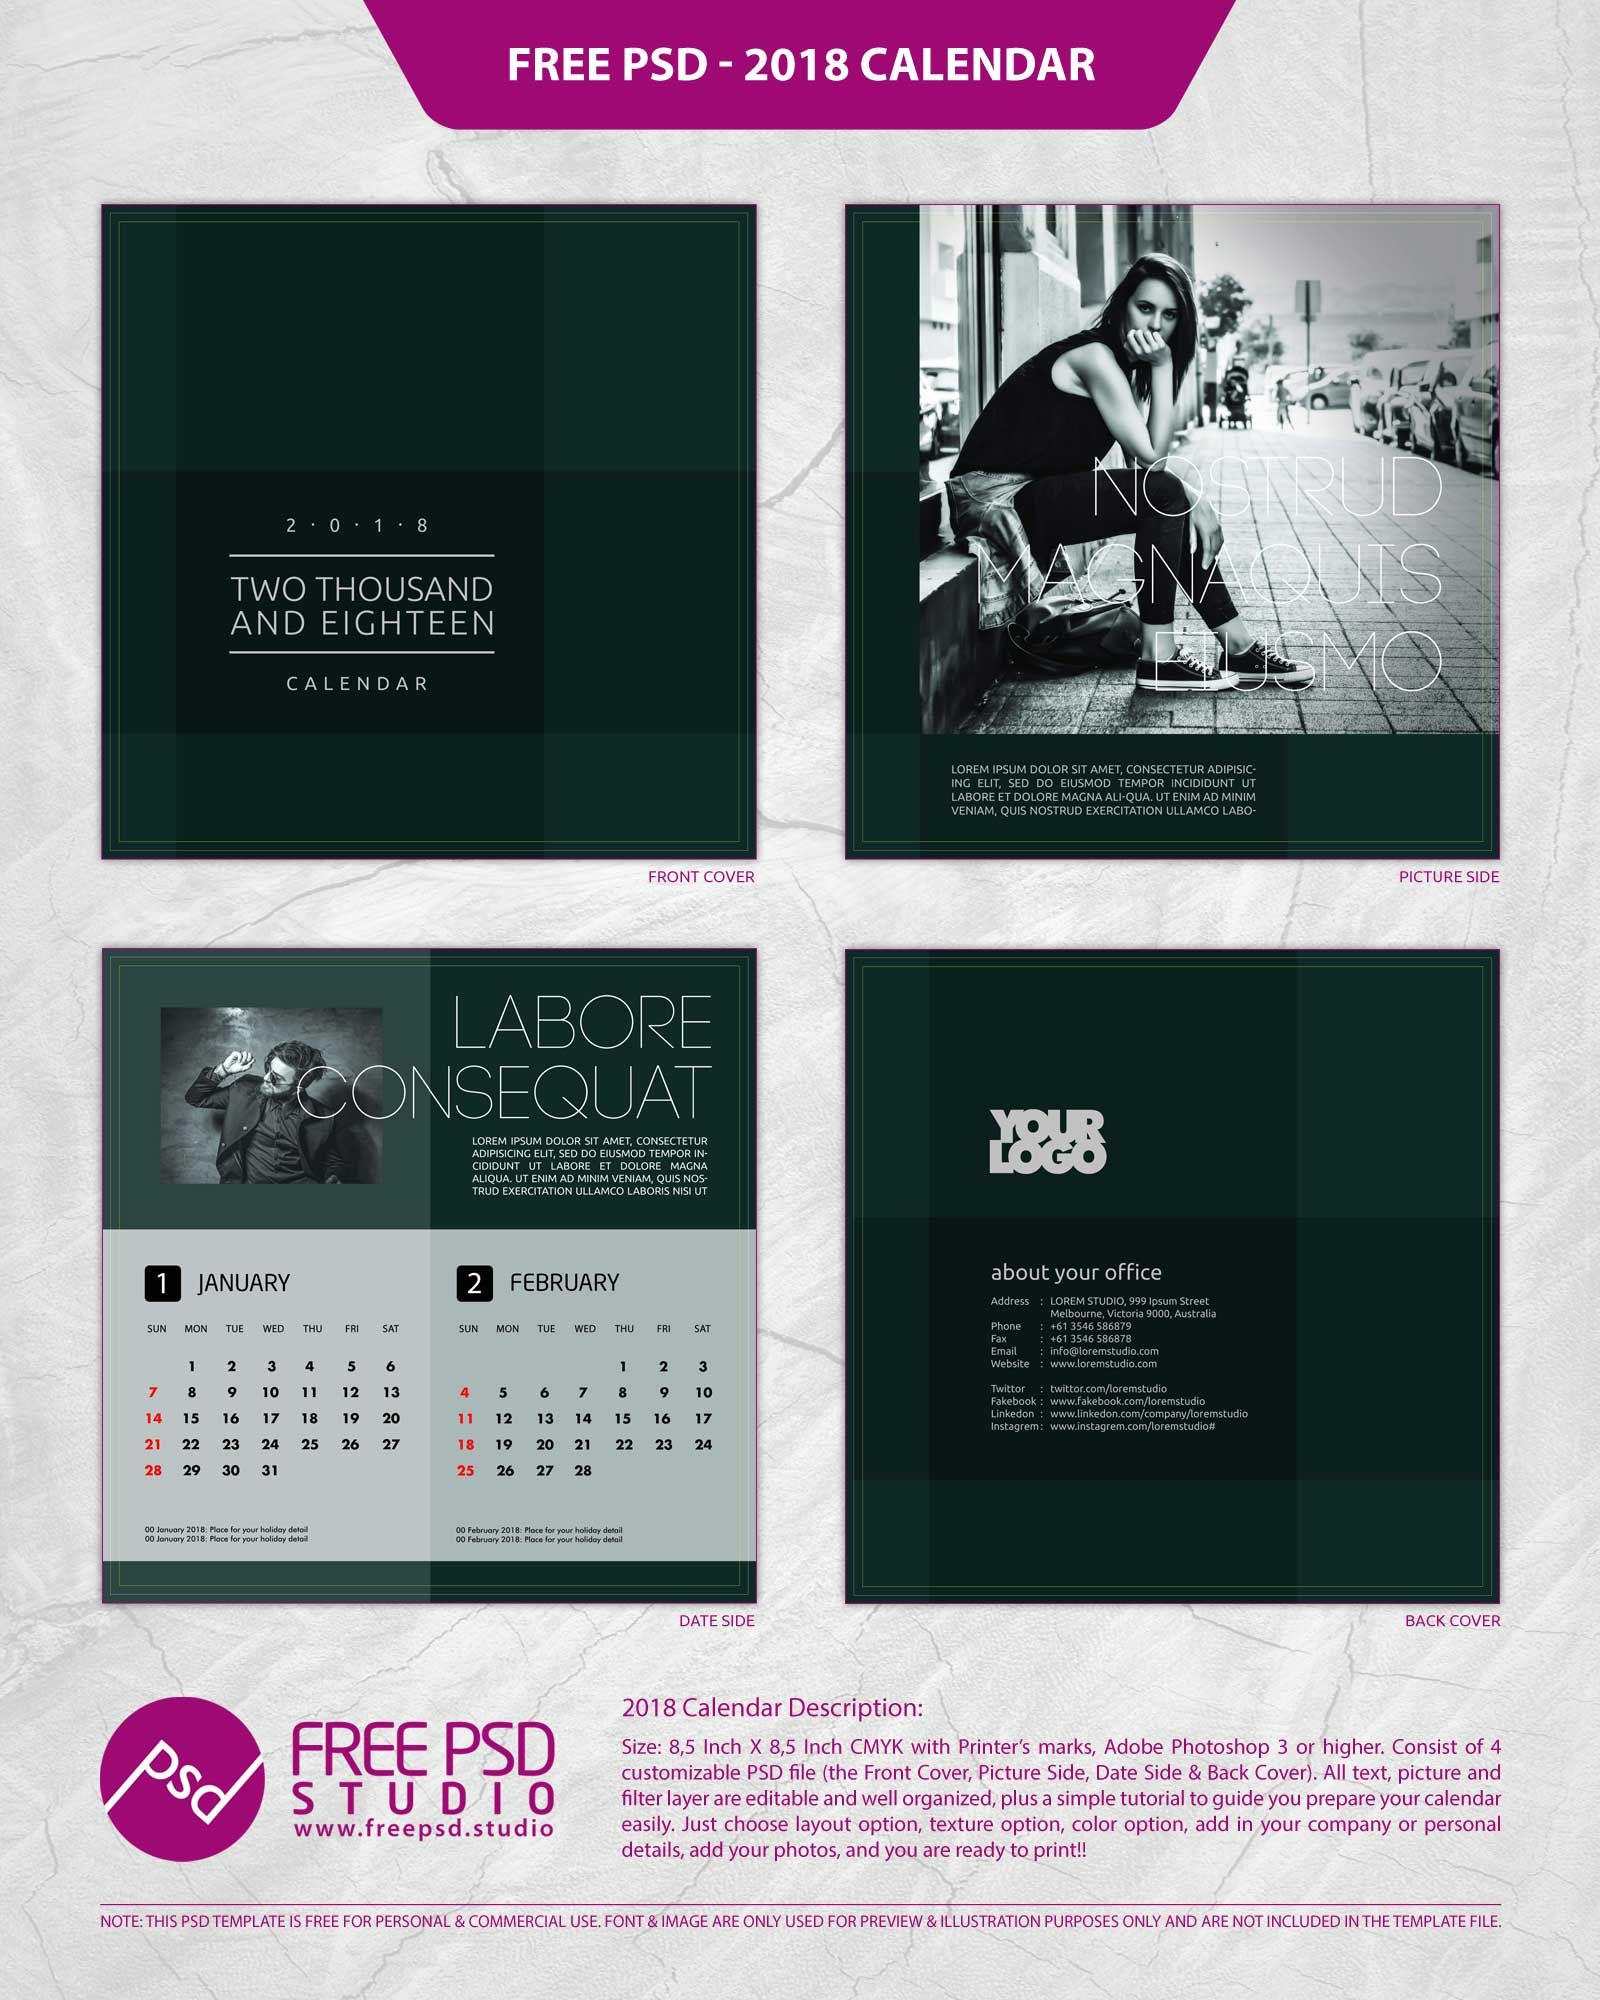 Calendar Design Template Psd : Calendar psd template free